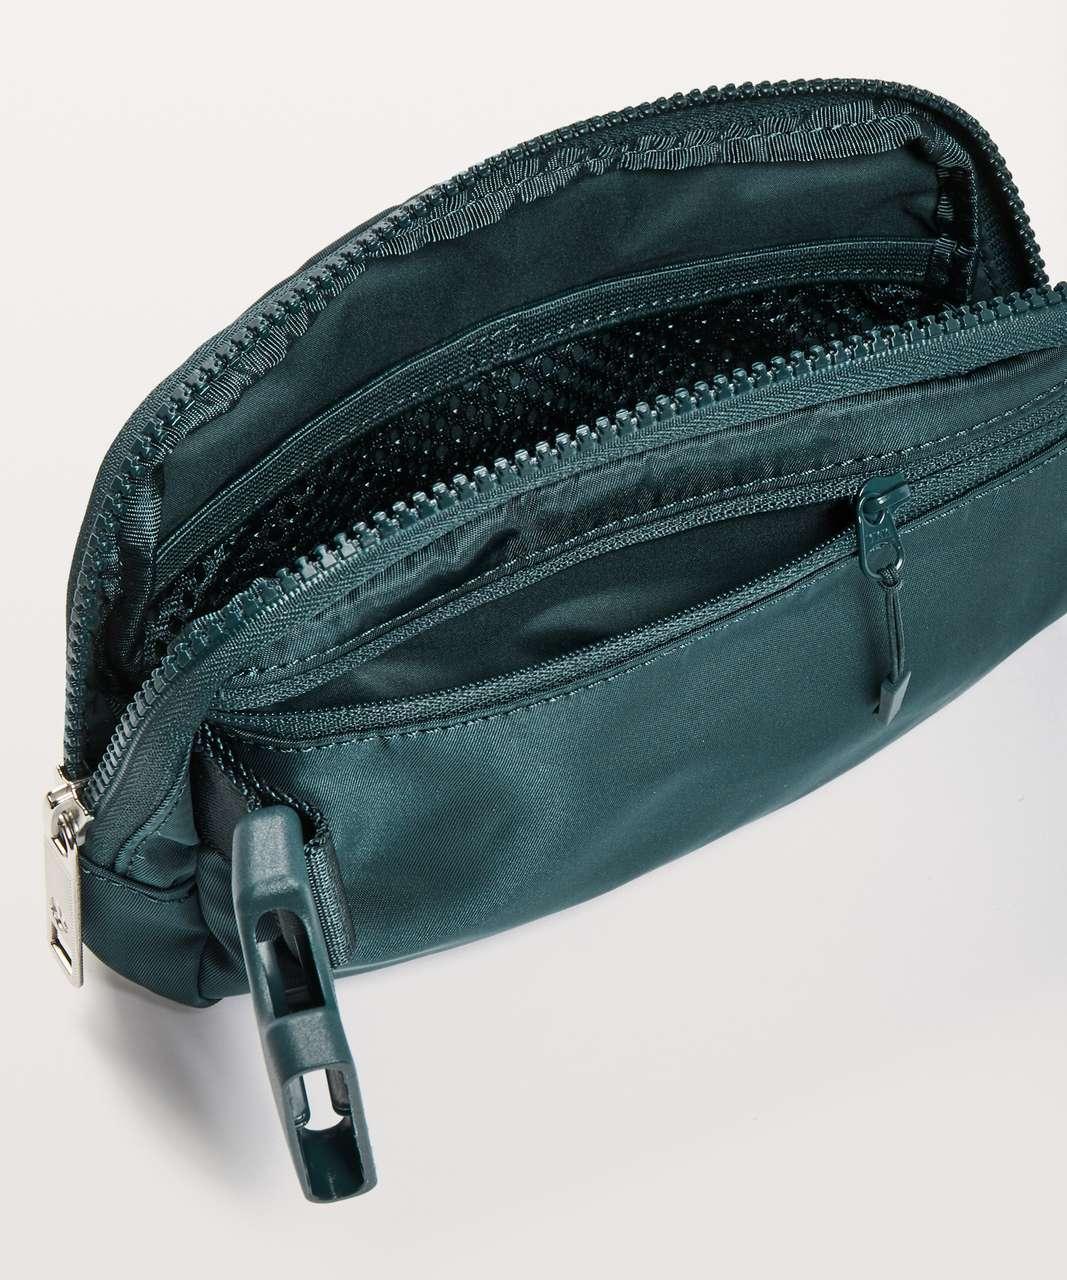 Lululemon Everywhere Belt Bag *1L - Teal Shadow